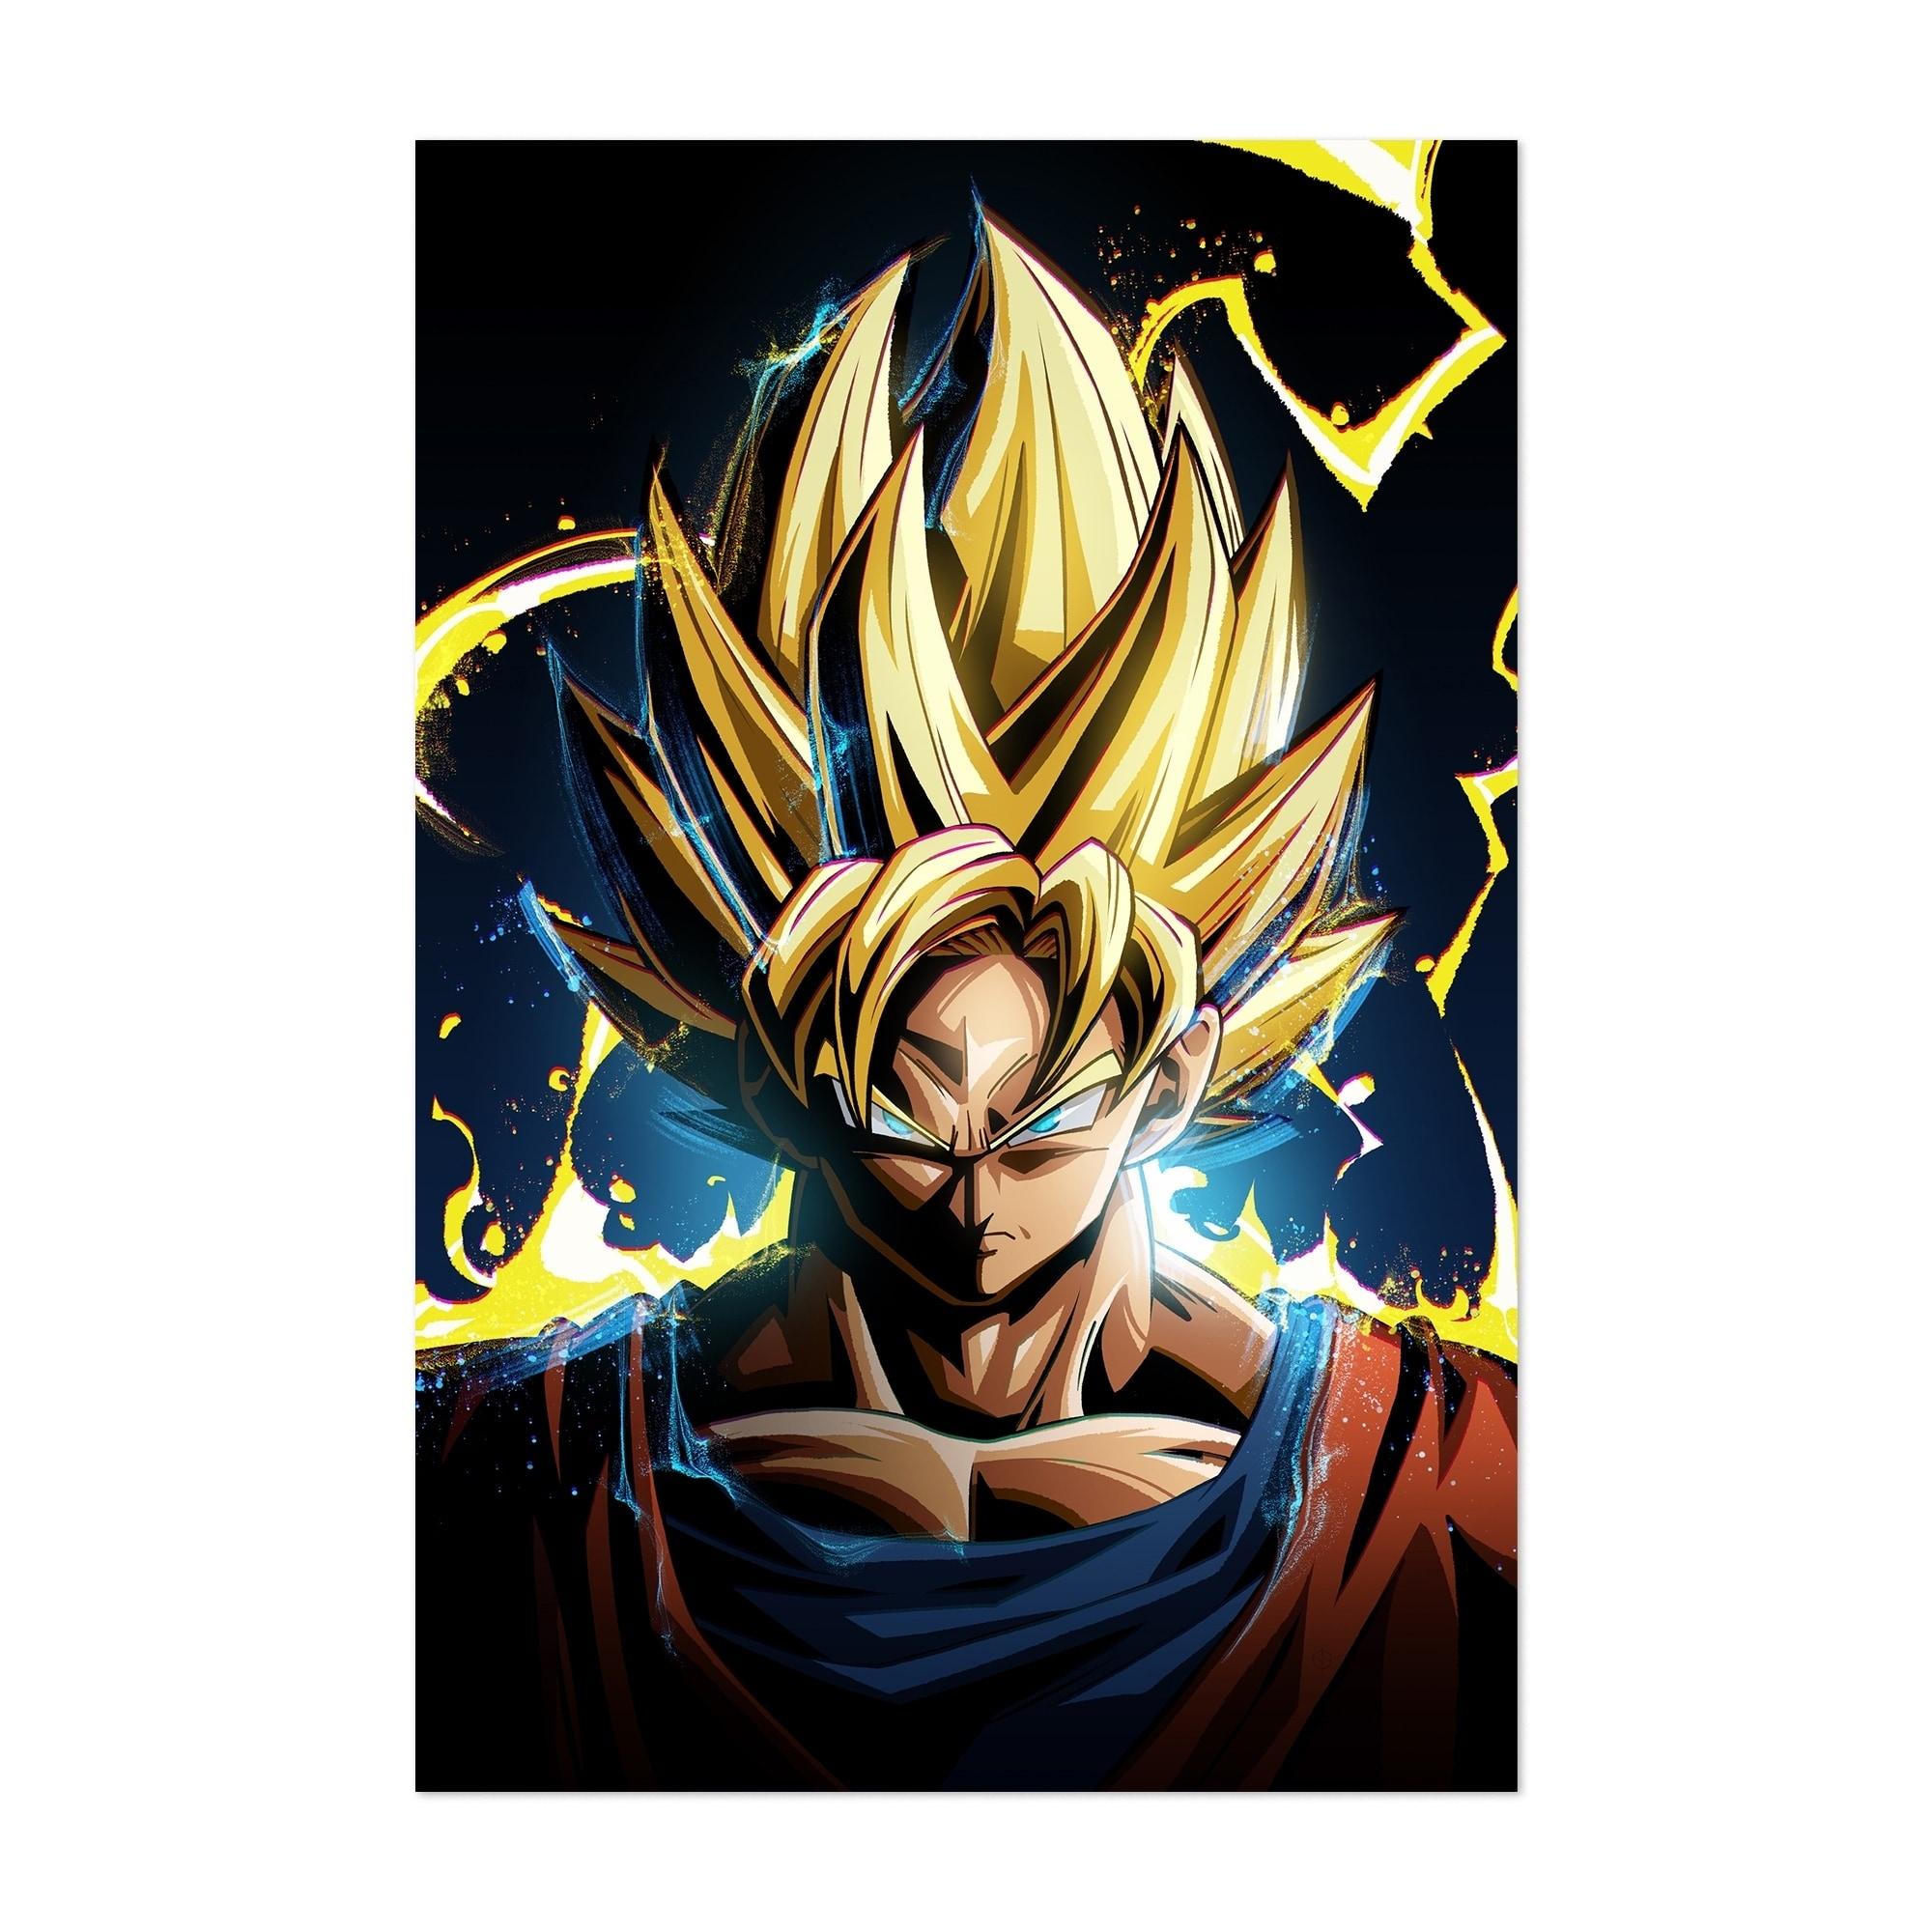 US Seller decoration art Dragon Ball Z Goku anime art poster